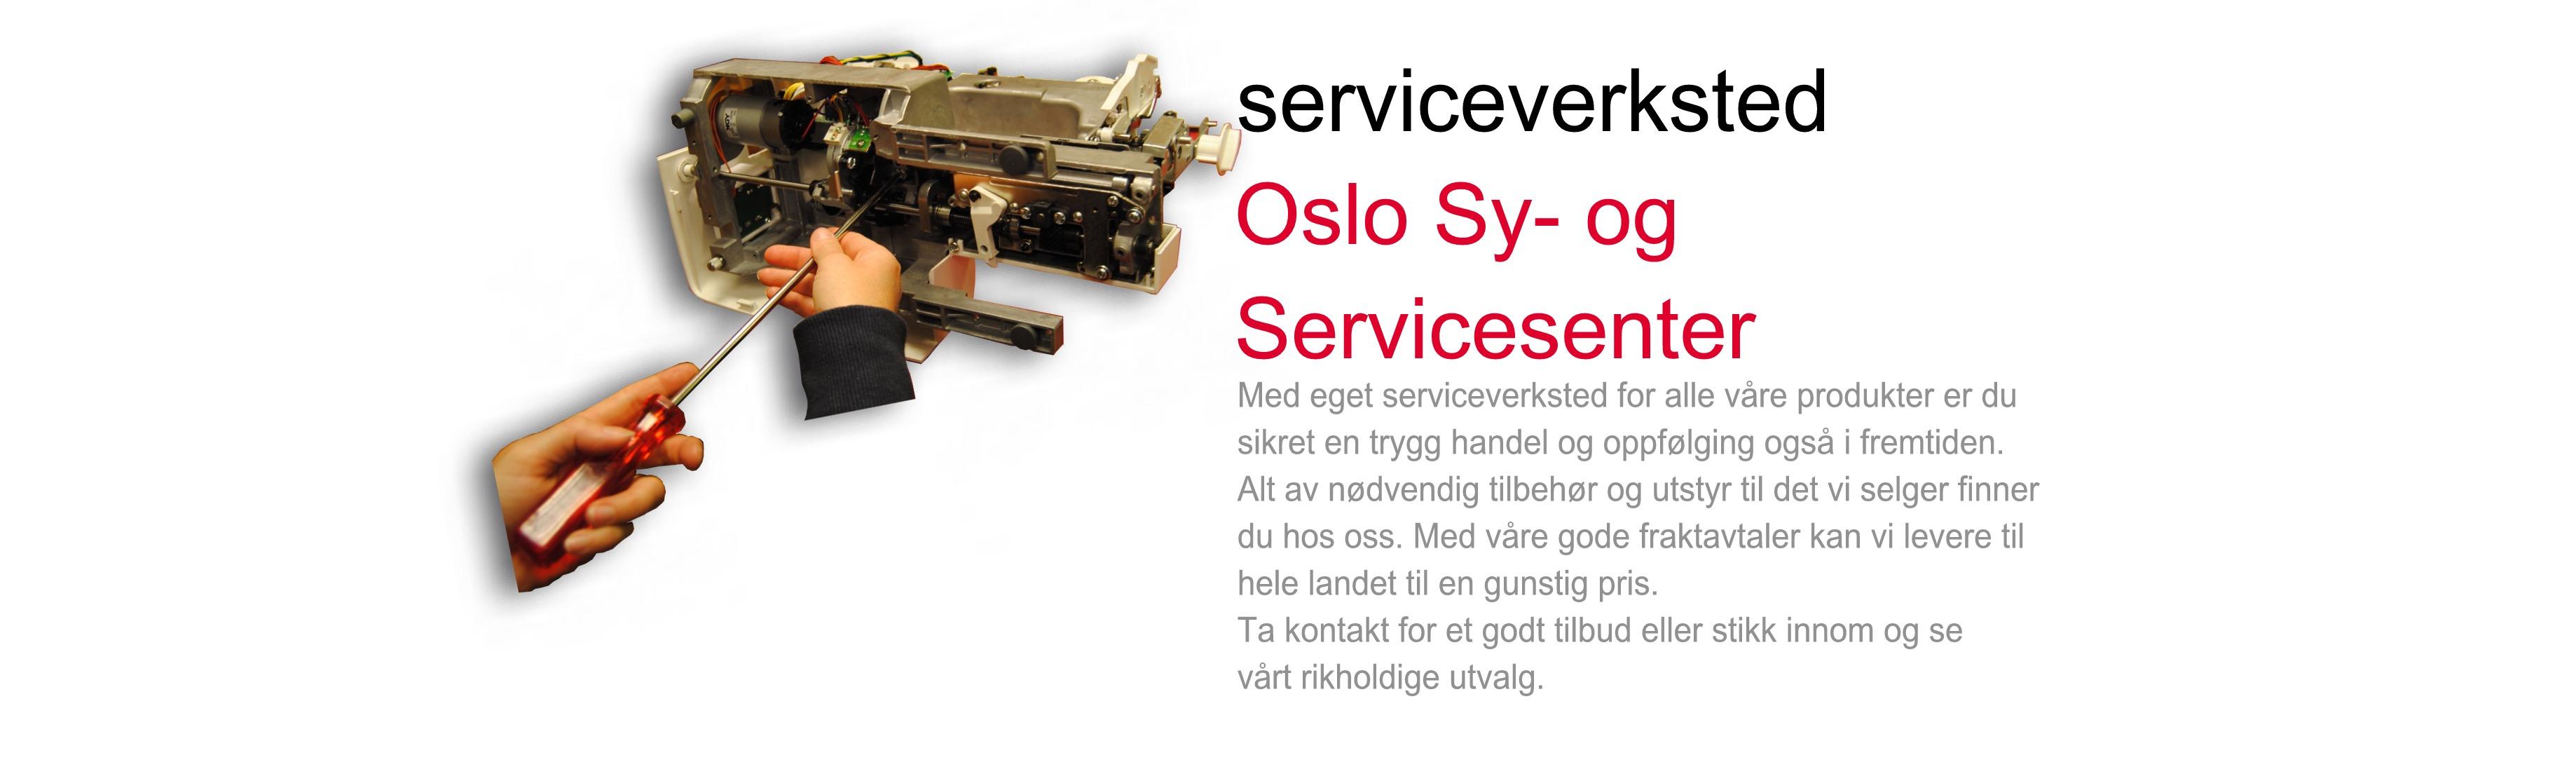 ESOS-SERVICEVERKSTED1